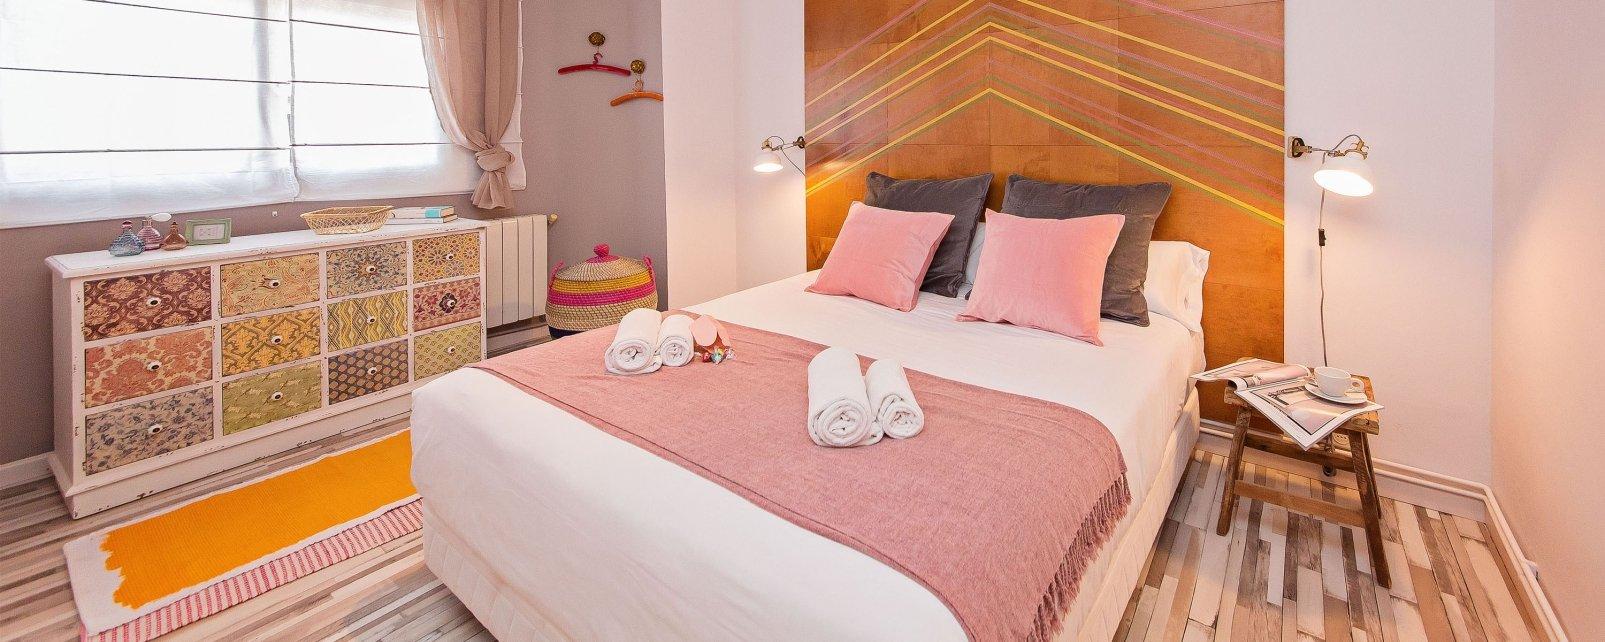 Hôtel Sweet Inn Apartments Barcelona Charming in Sant Gervasi